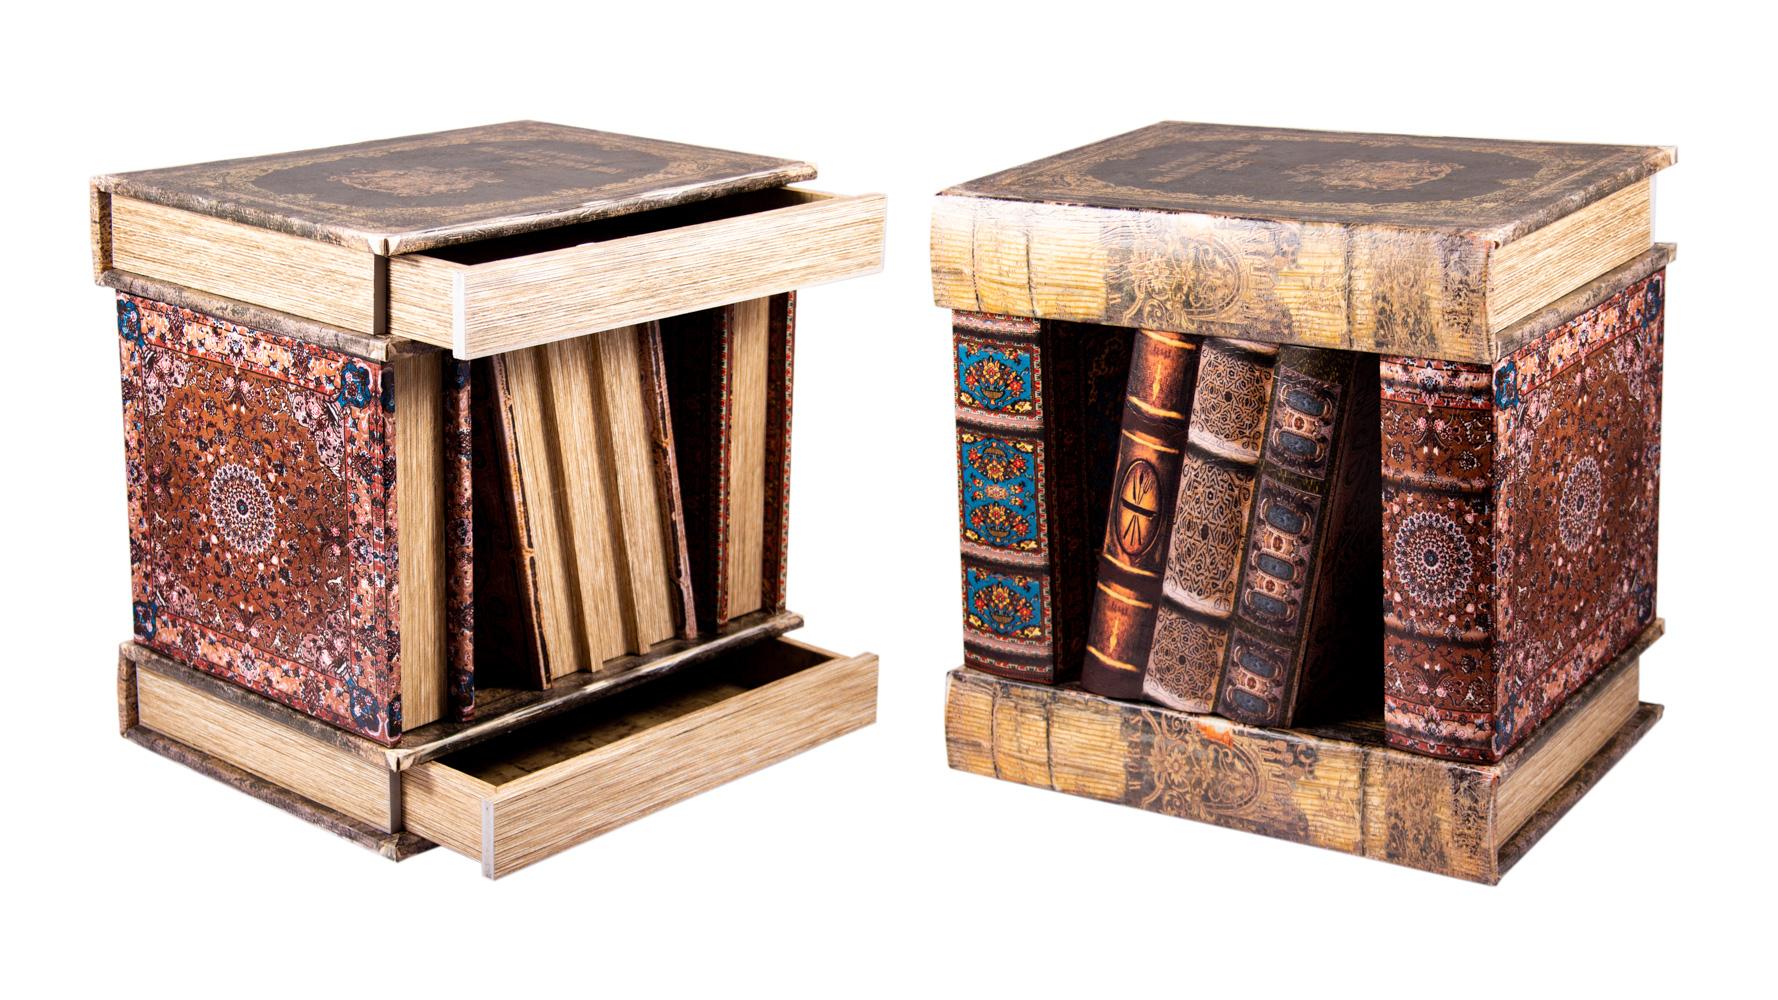 Тумбочка Книги, 33x34x37 см, арт. 184612